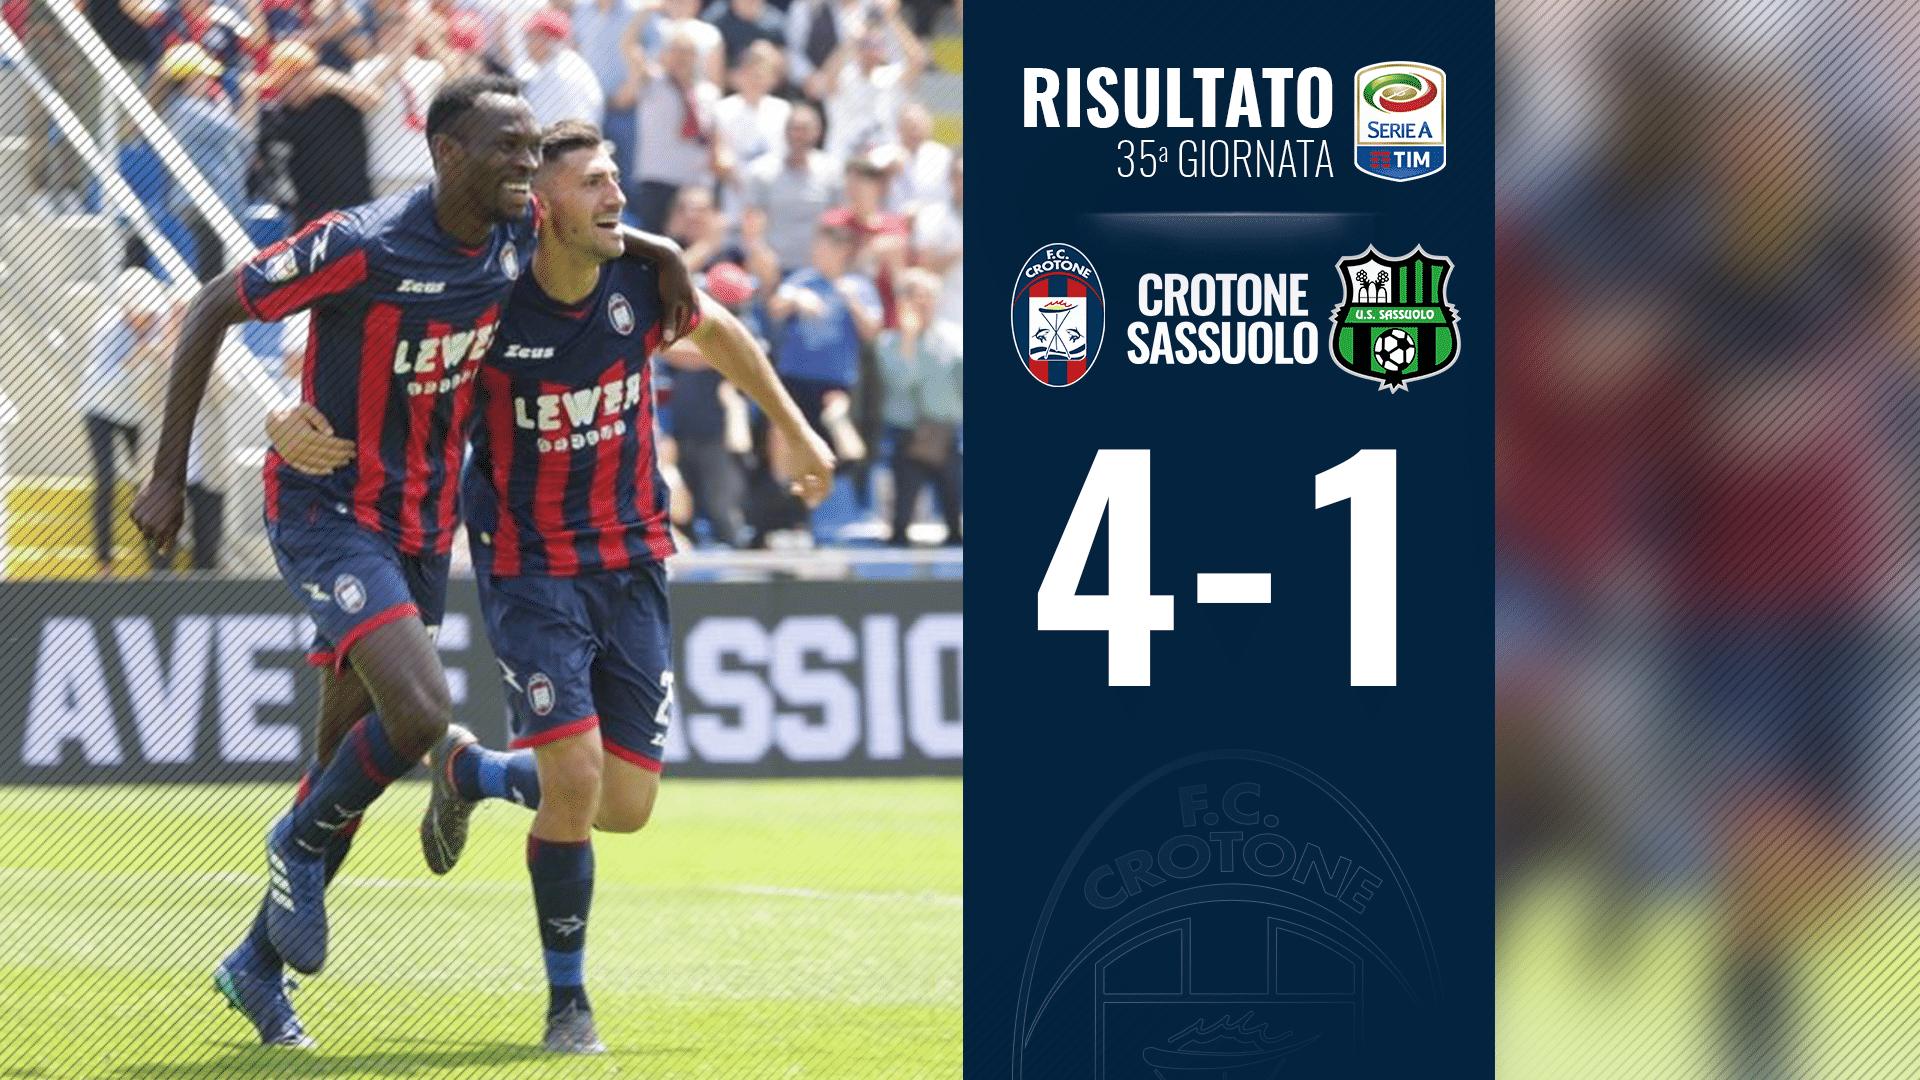 Seria A, 35a giornata: Crotone-Sassuolo 4-1